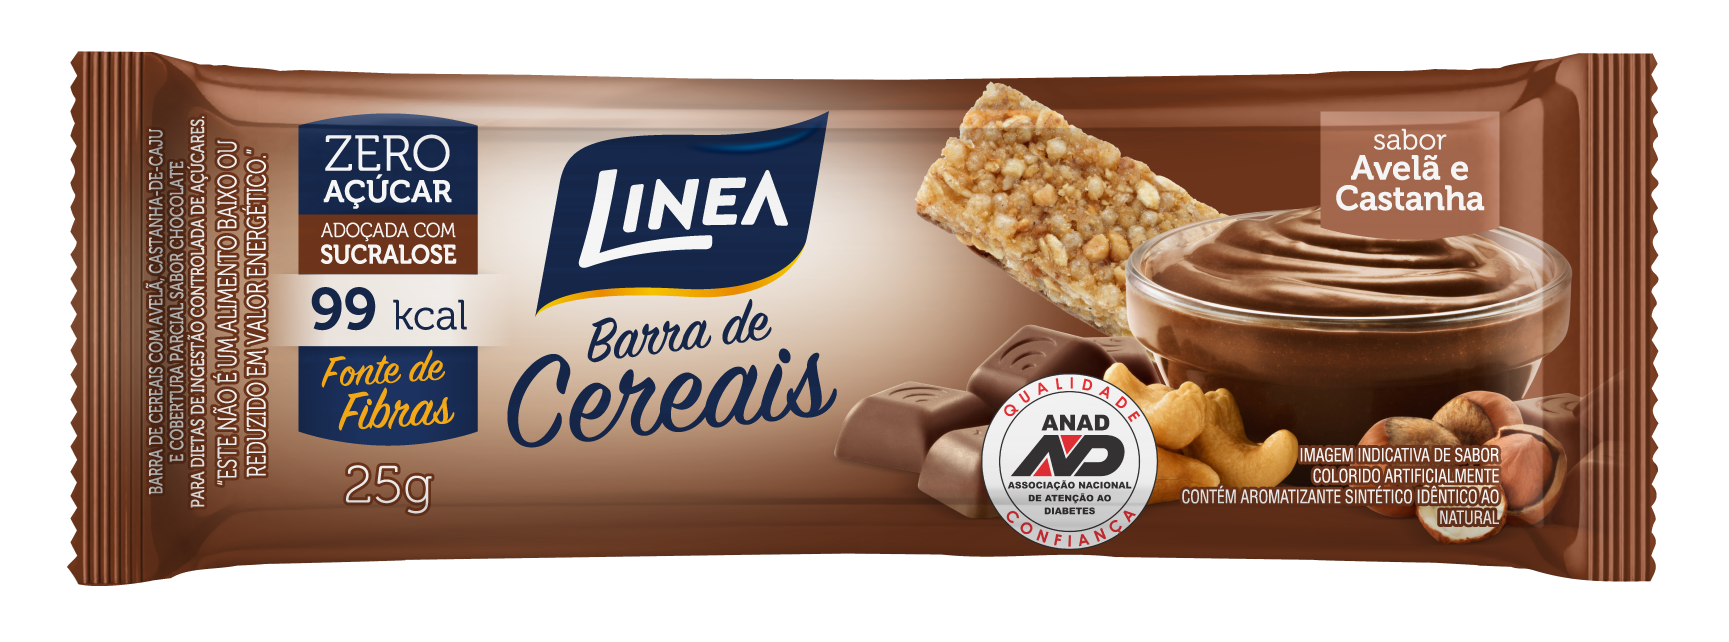 Barra de Cereais_LINEA_Avela